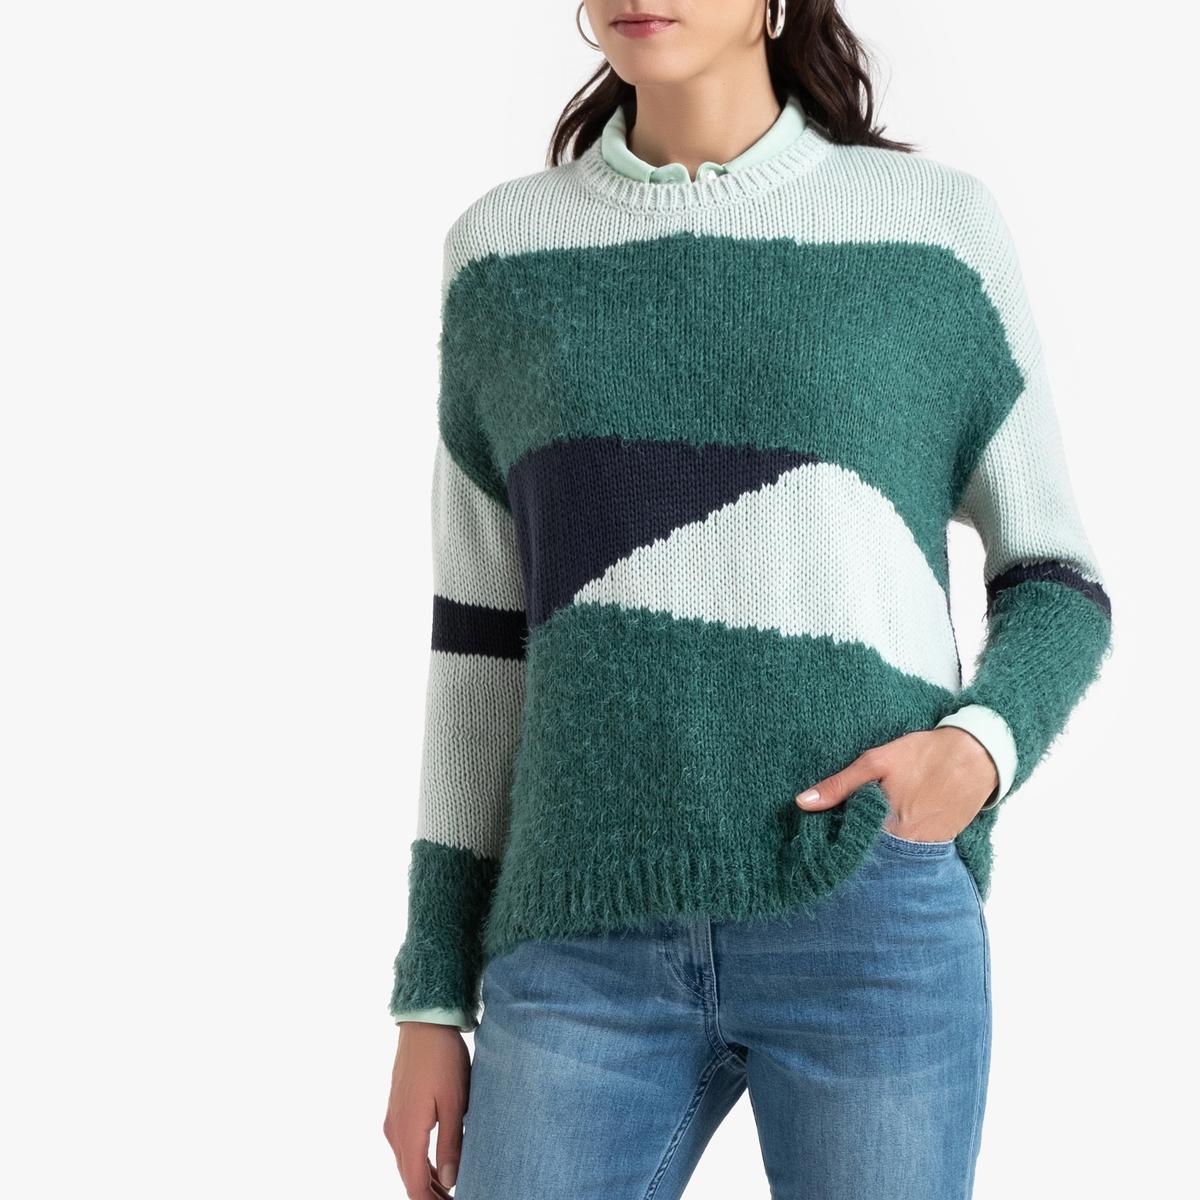 Пуловер La Redoute С рисунком интарсия из плотного трикотажа 46/48 (FR) - 52/54 (RUS) зеленый